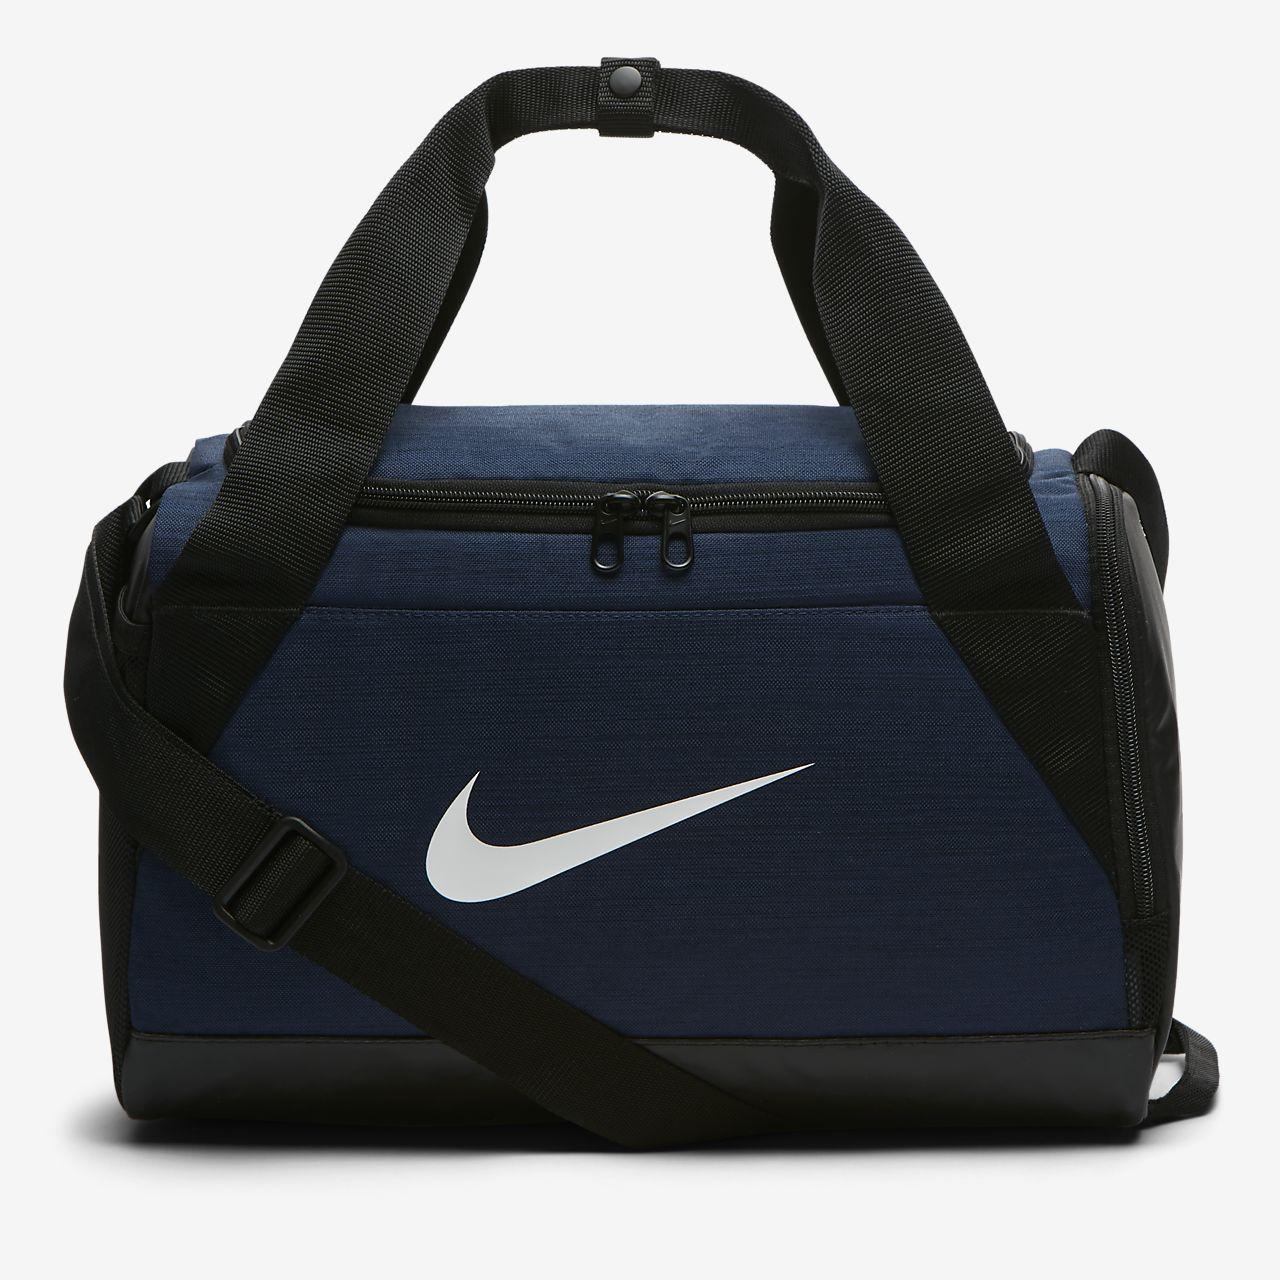 355b864497 Nike Brasilia (Extra Small) Training Duffel Bag. Nike.com CZ